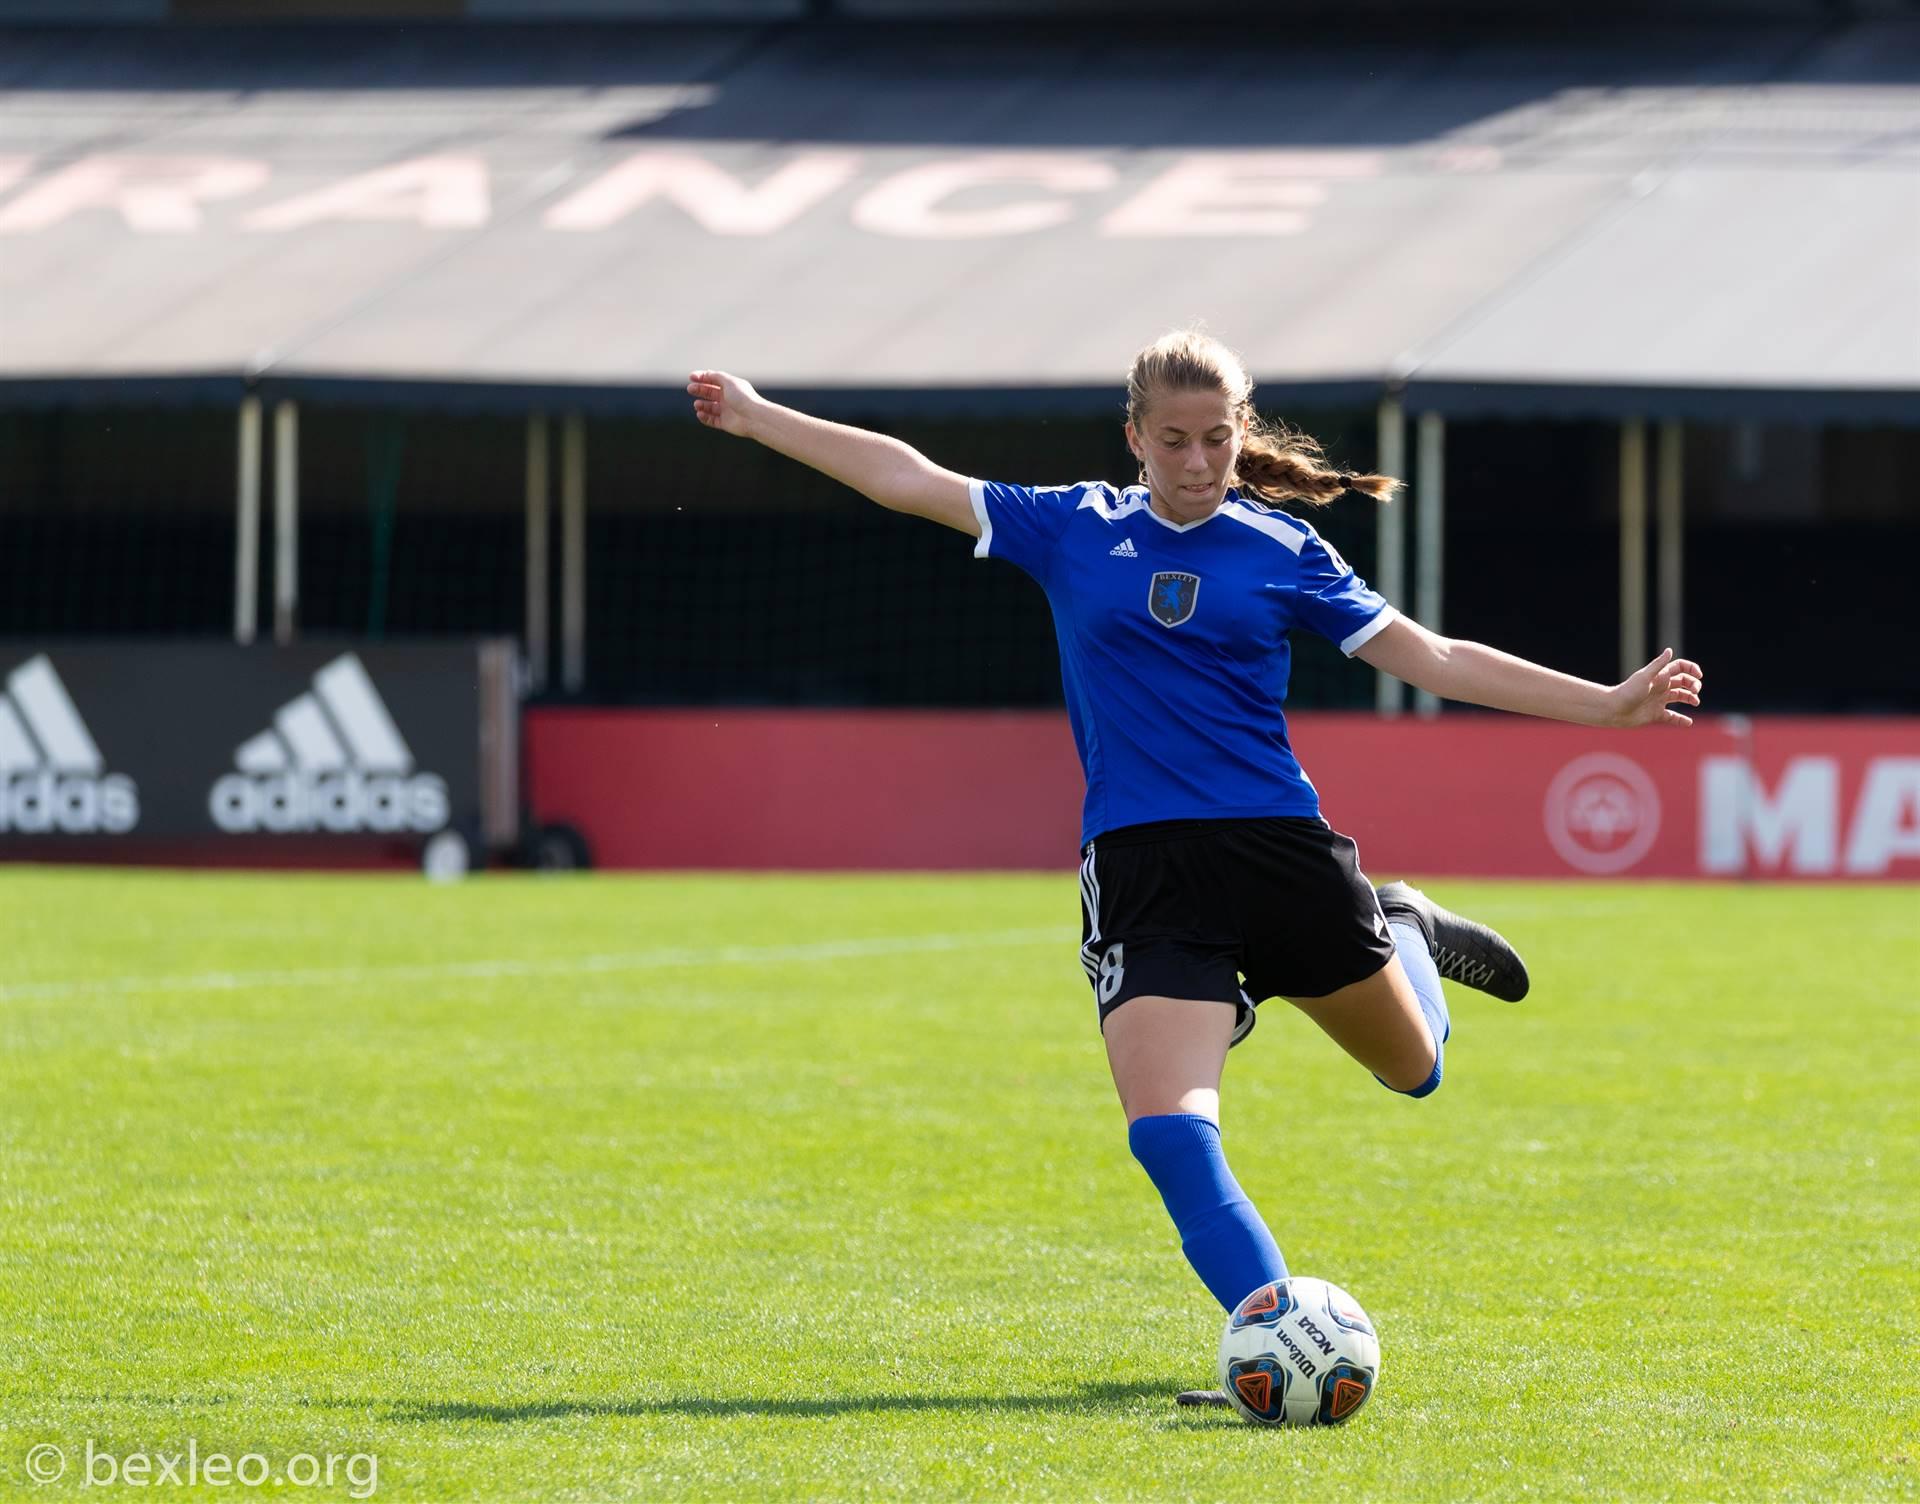 Girls Soccer Player executes a free kick @ Crew Stadium